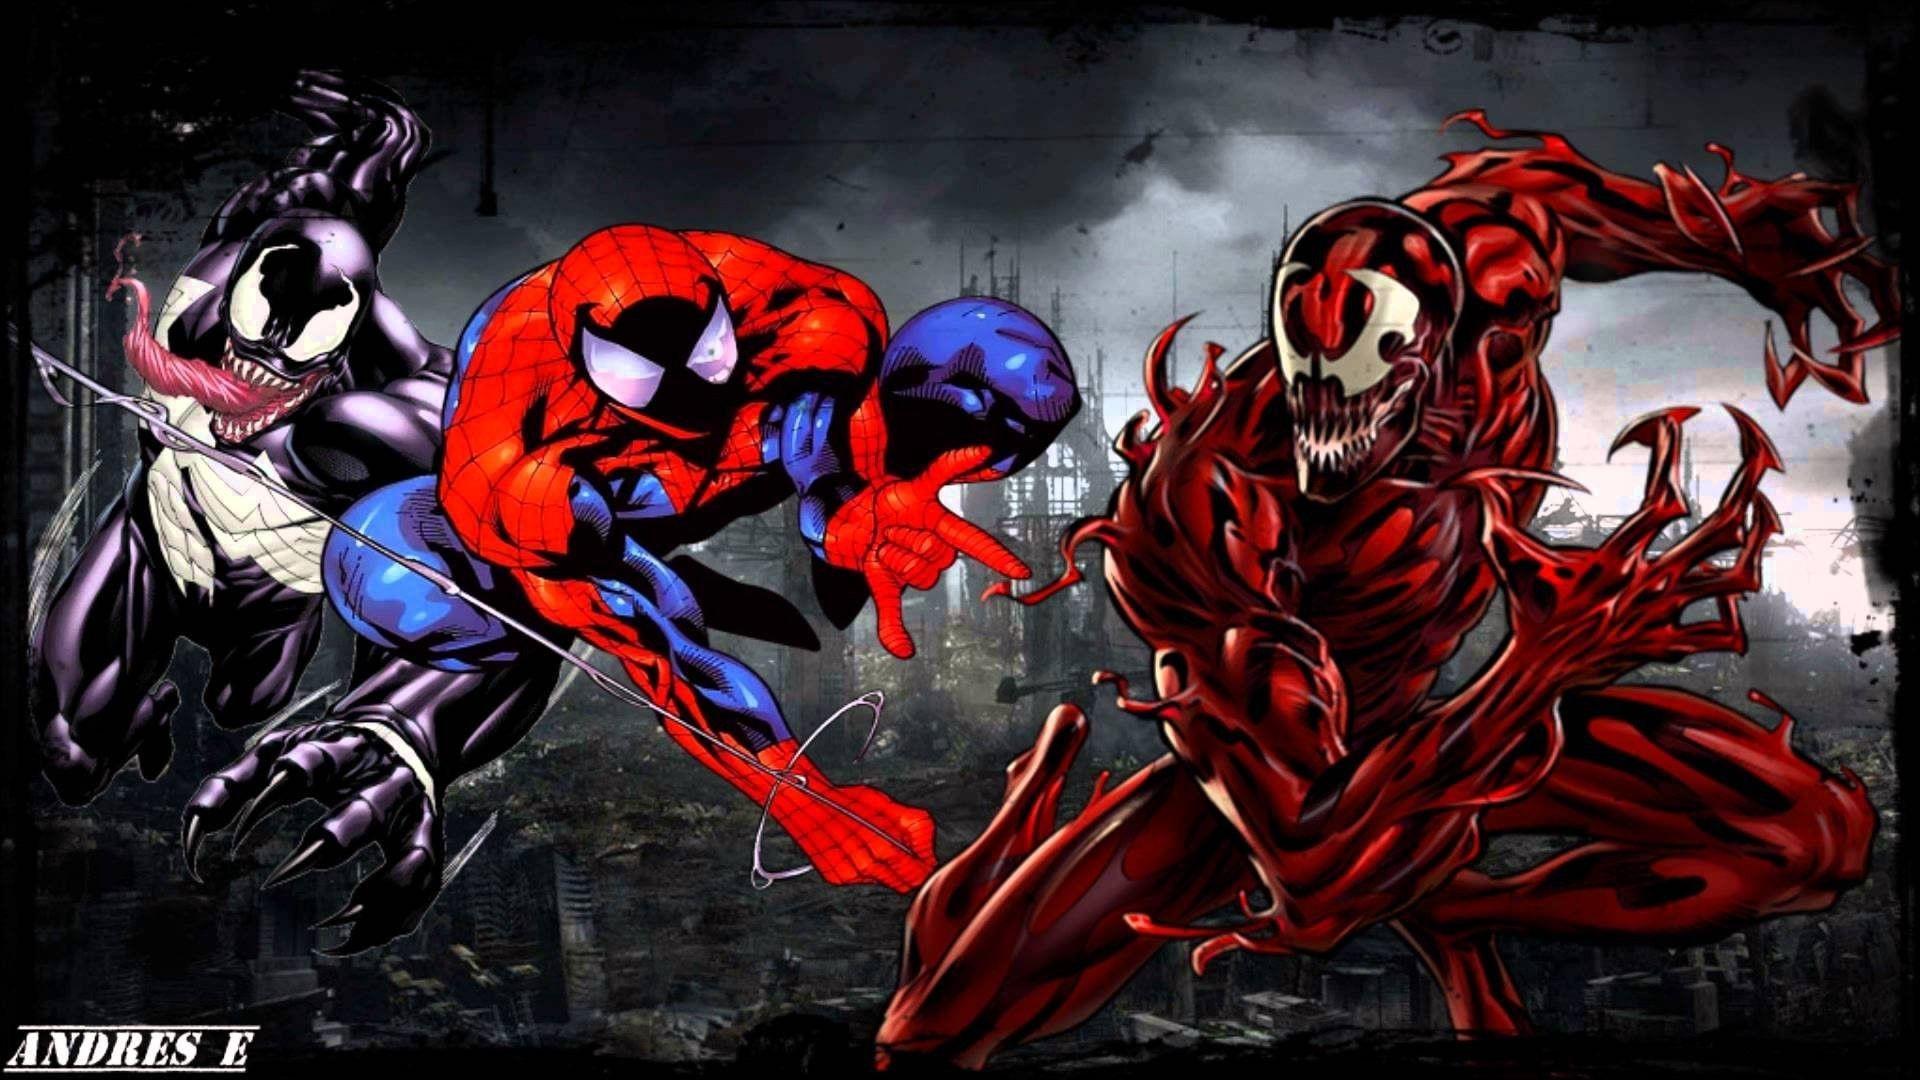 Venom Vs Carnage Wallpaper Hd